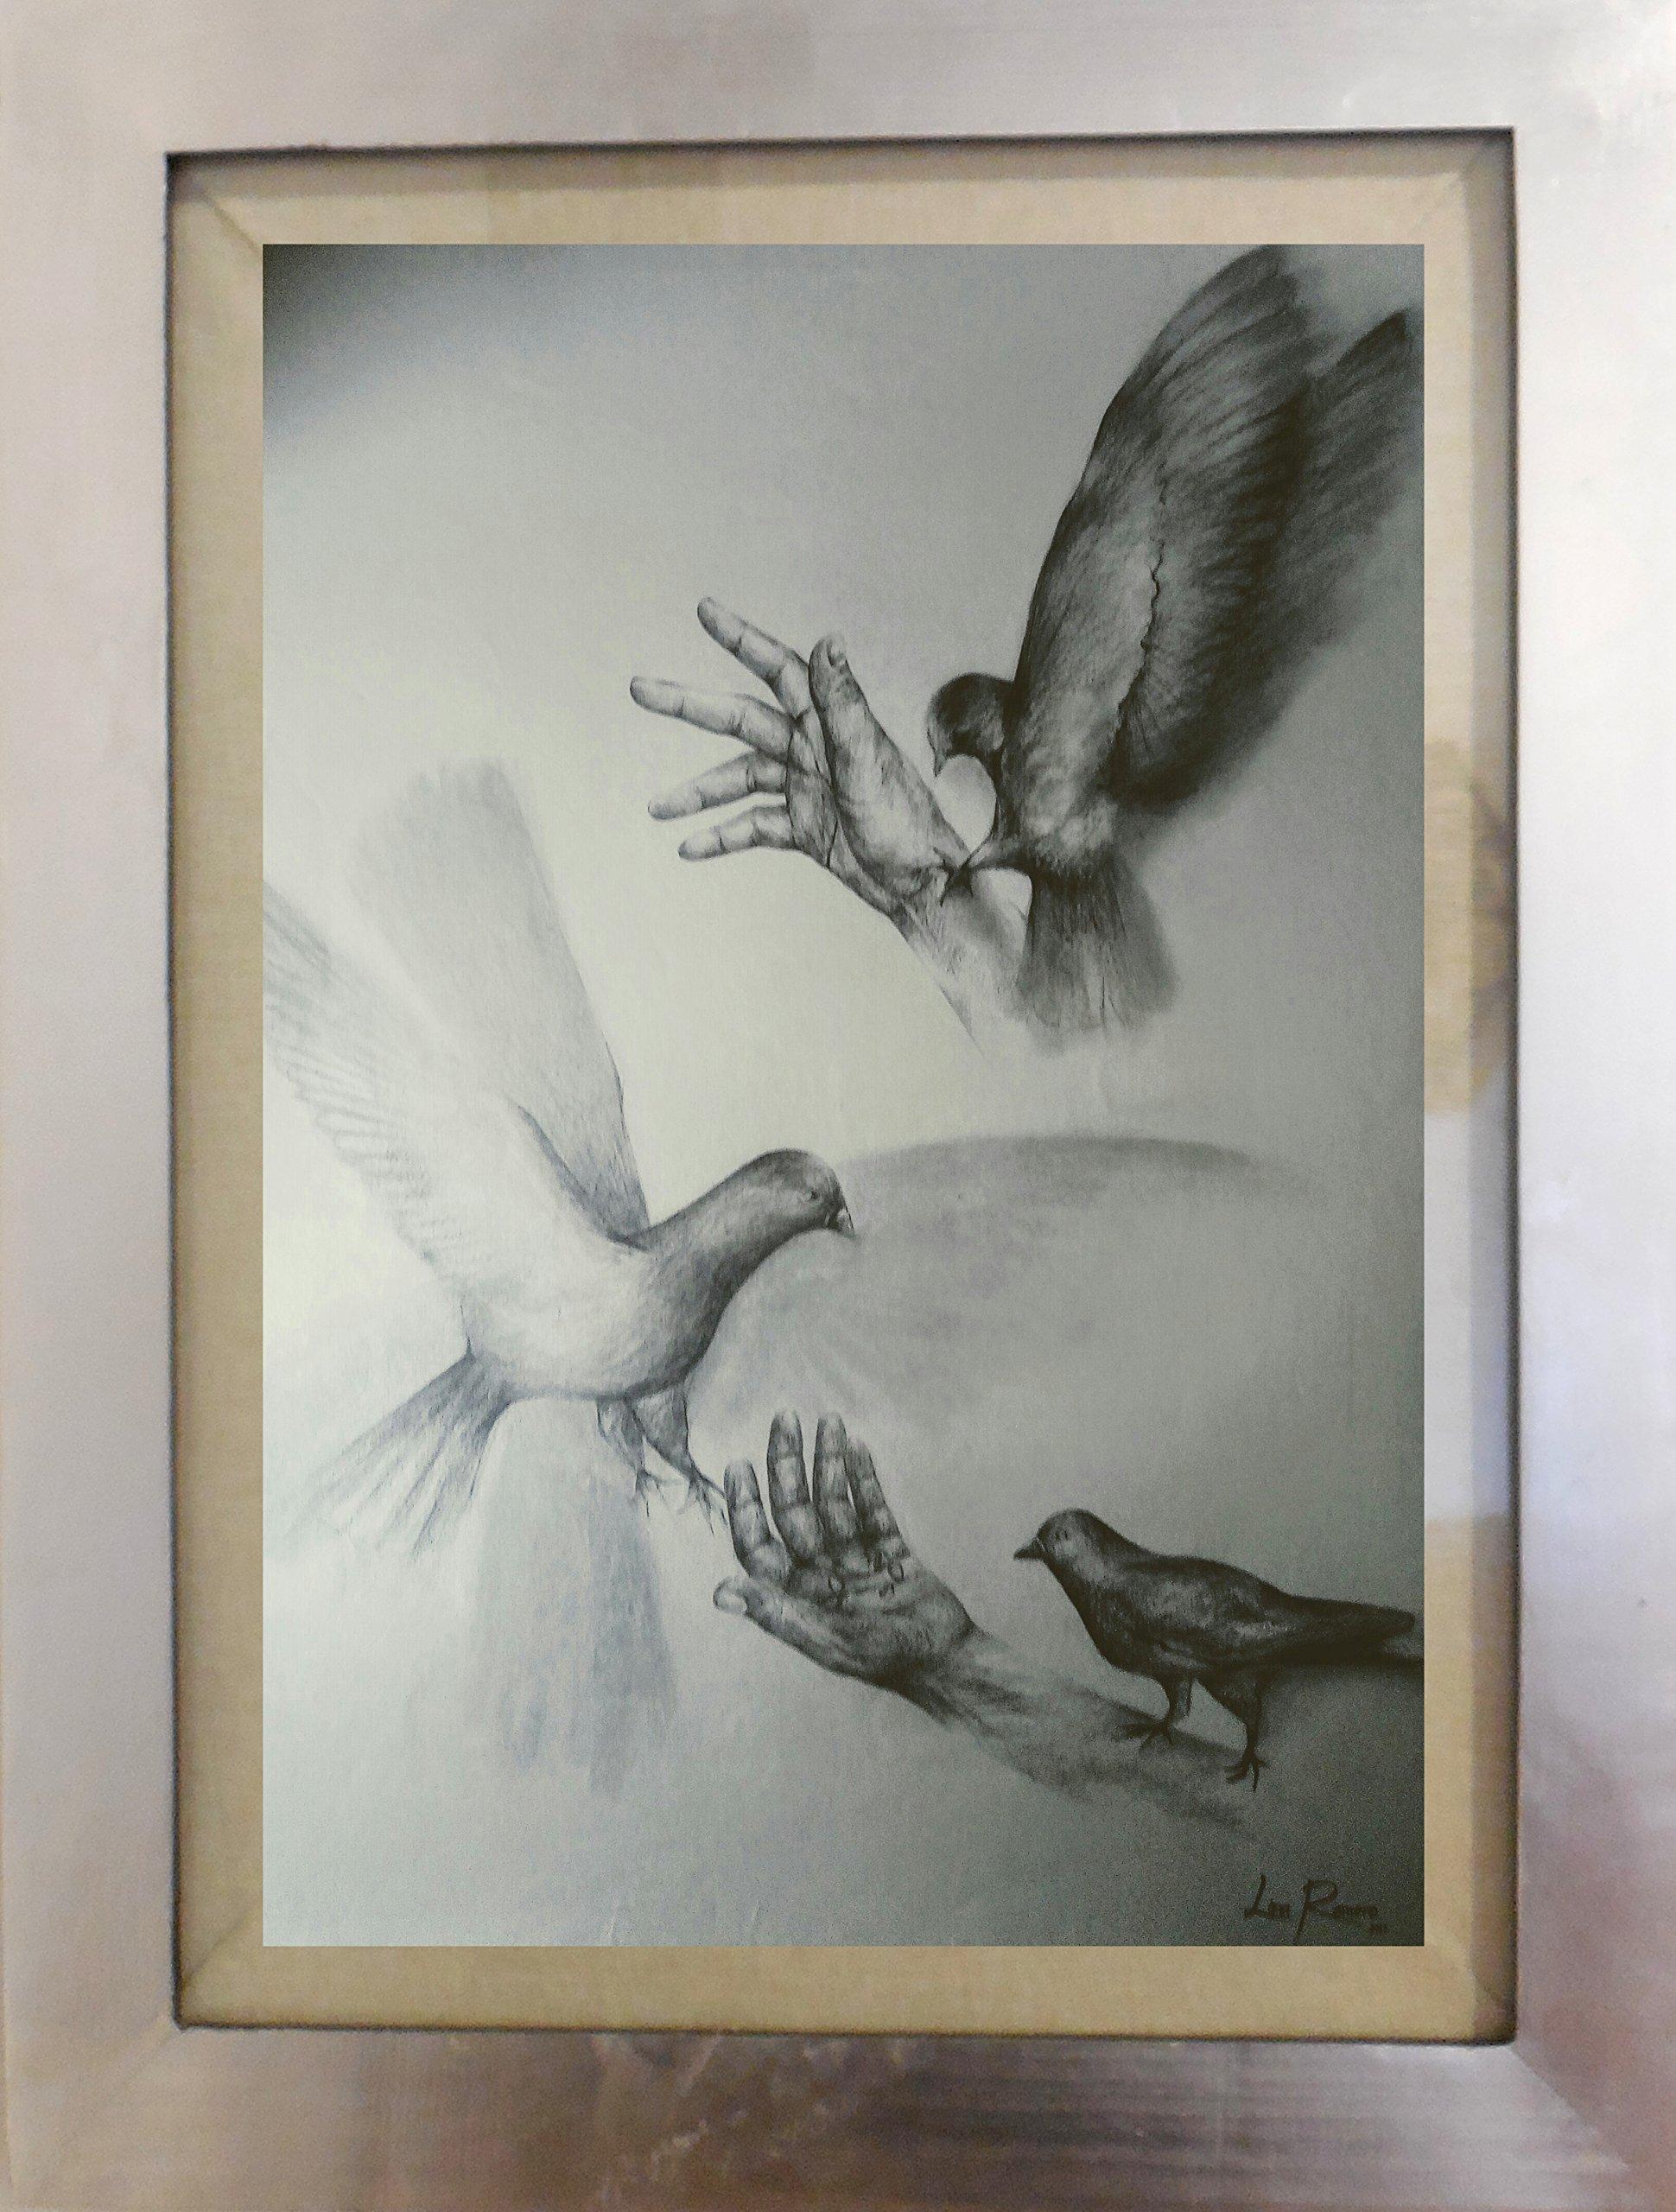 Charcoal Drawing on Sulphated Paper Framed Silver Leaf Original Artwork Handmade